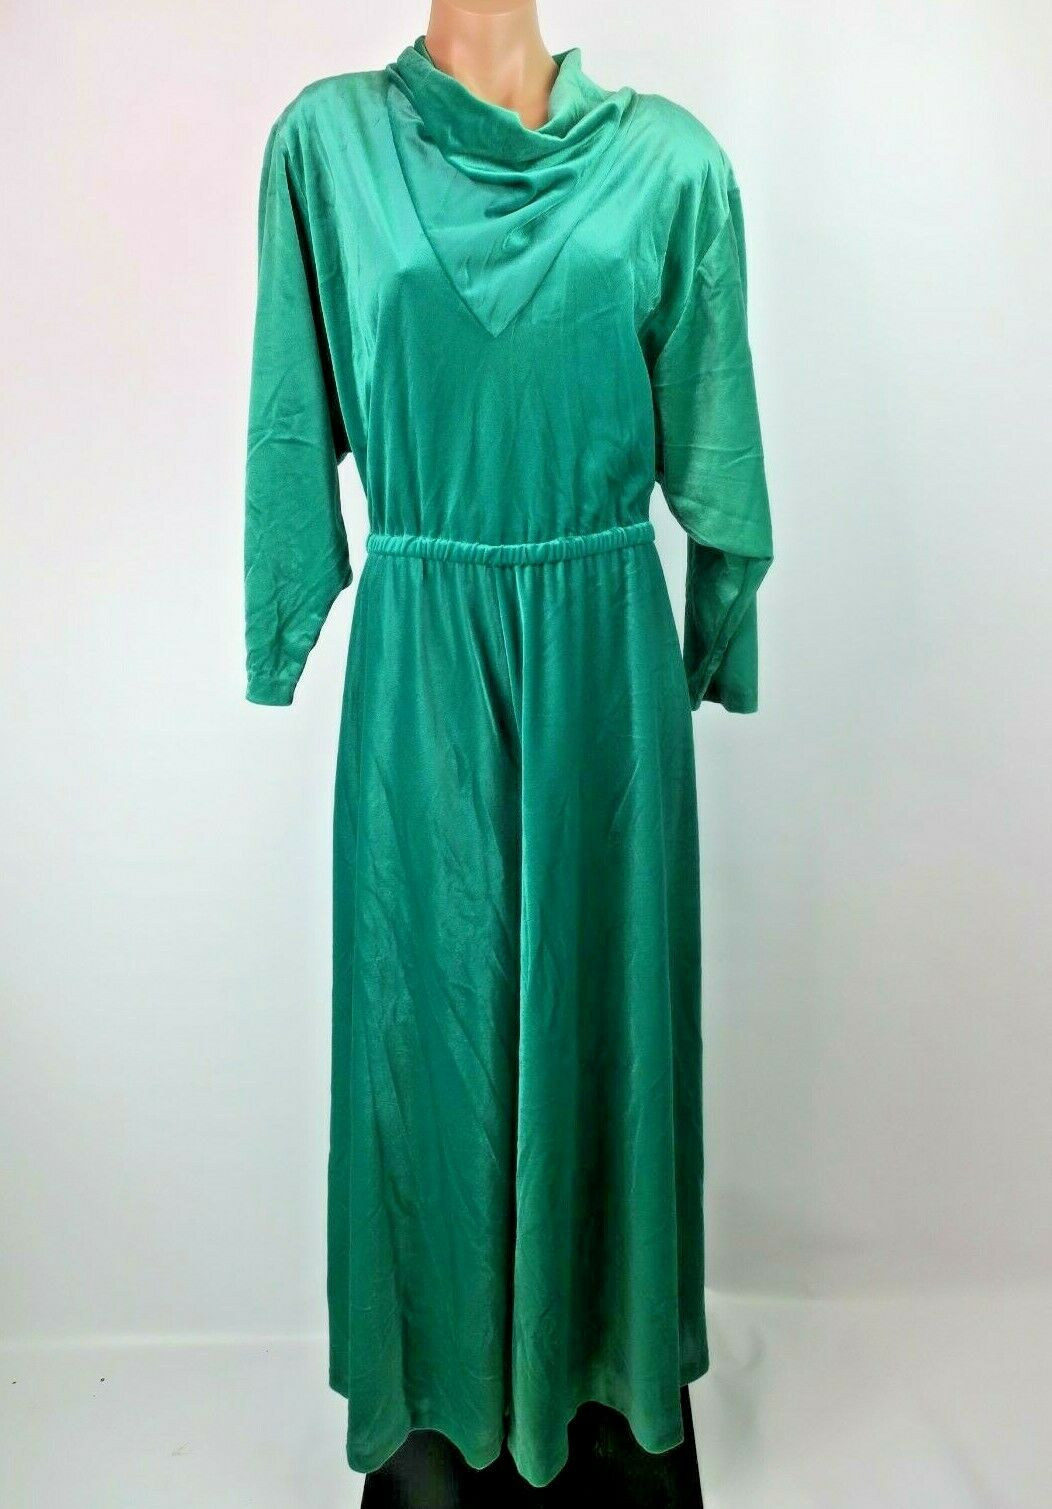 DAVID BROWN - 1980s Emerald Green Velour Caftan Jumpsuit Housecoat Robe M RARE